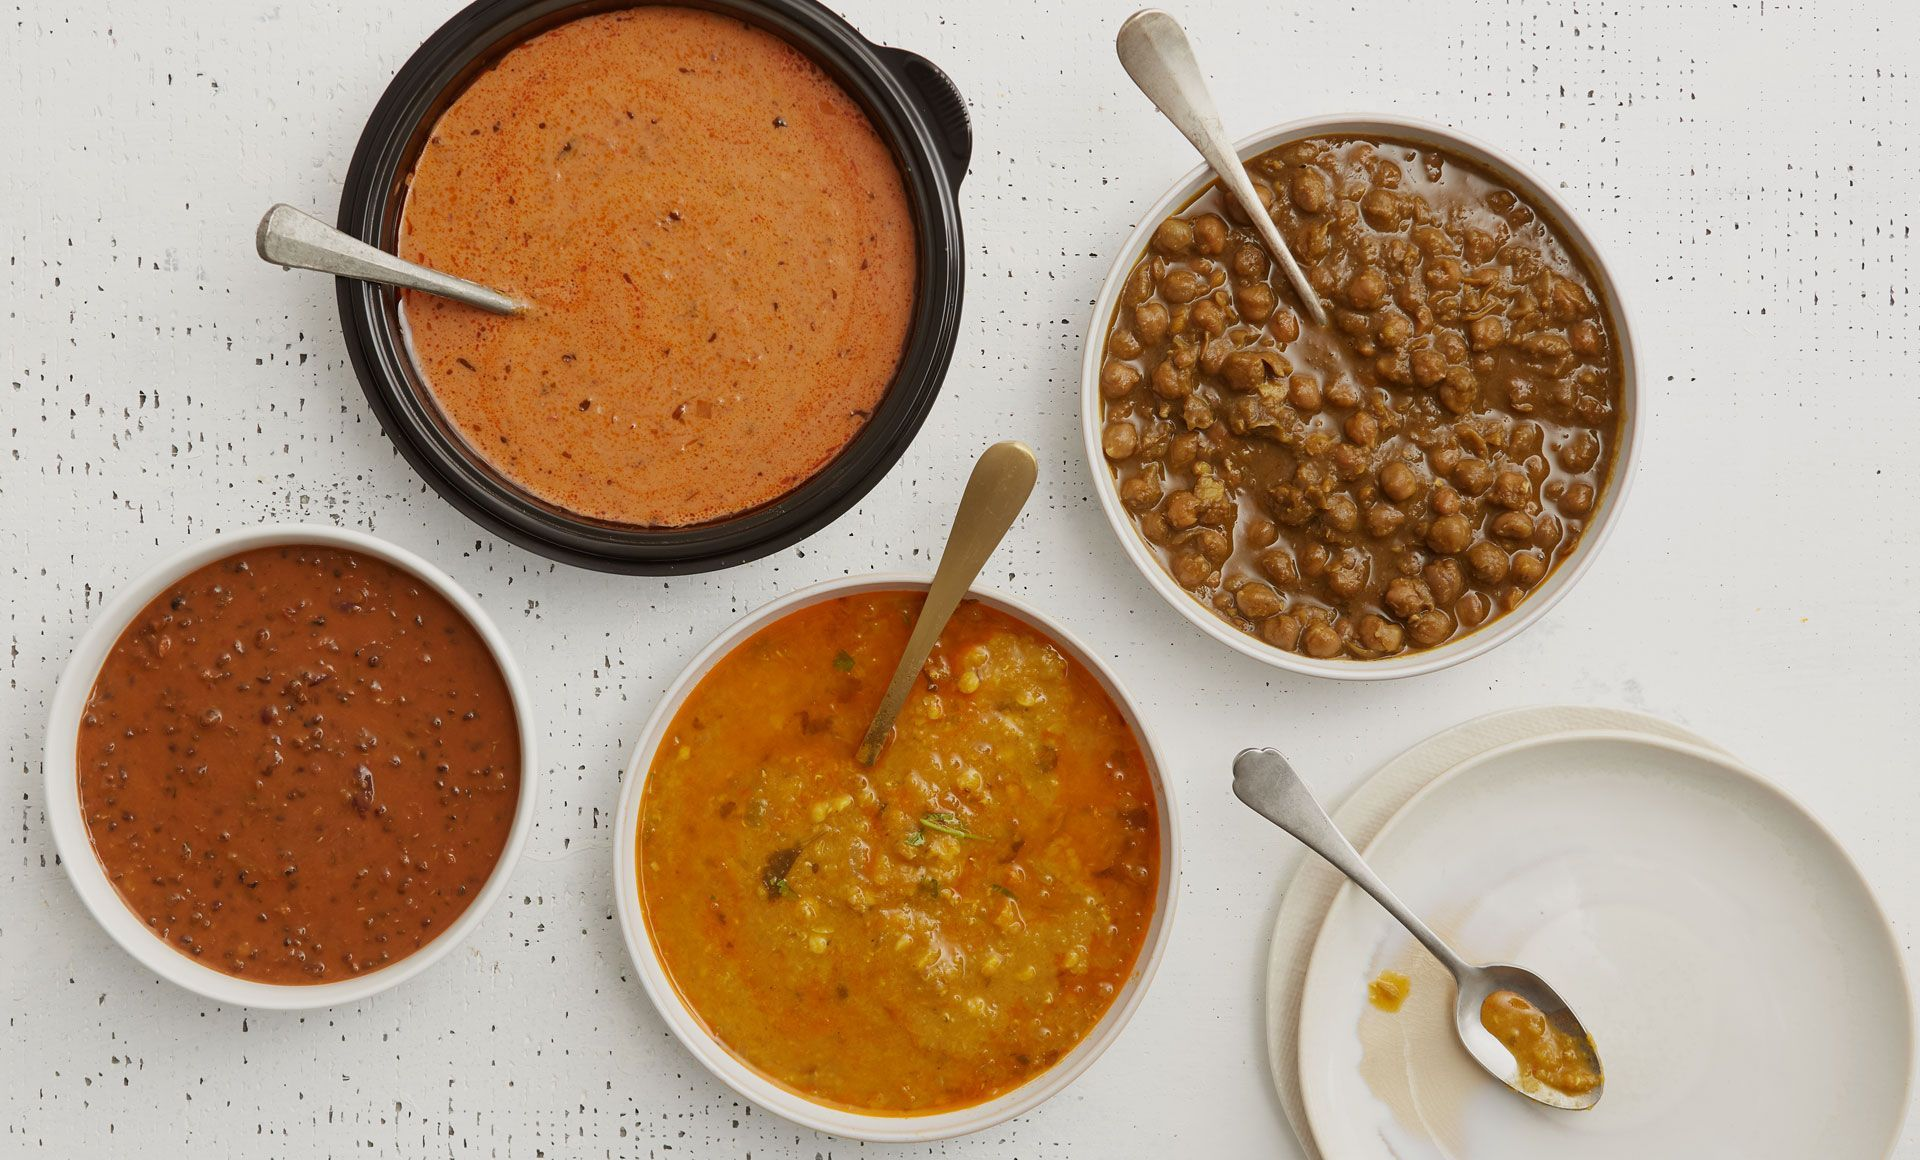 tikka masala, chickpea masala, black lentil daal and yellow lentil daal